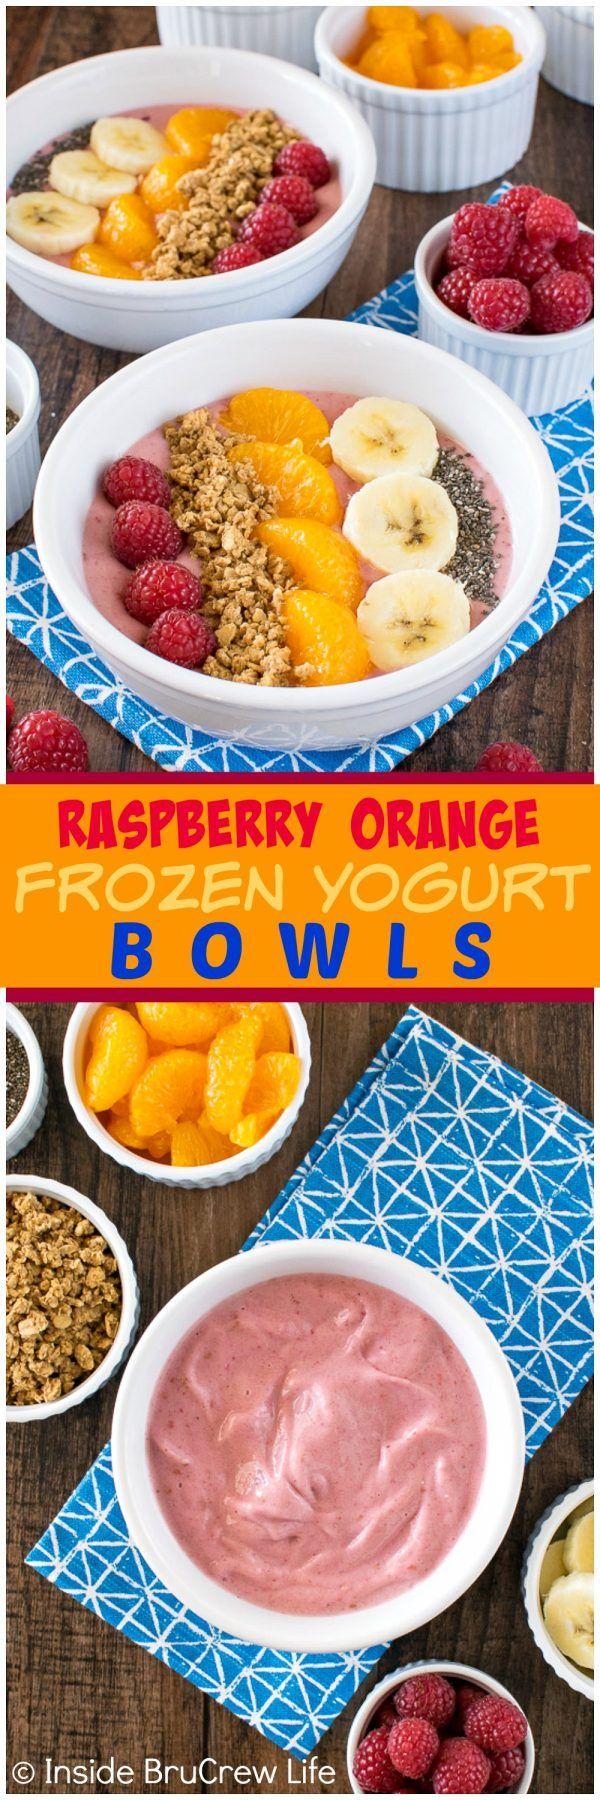 Raspberry Orange Frozen Yogurt Bowls - fresh fruit and granola adds a fun twist to this healthy frozen snack recipe.